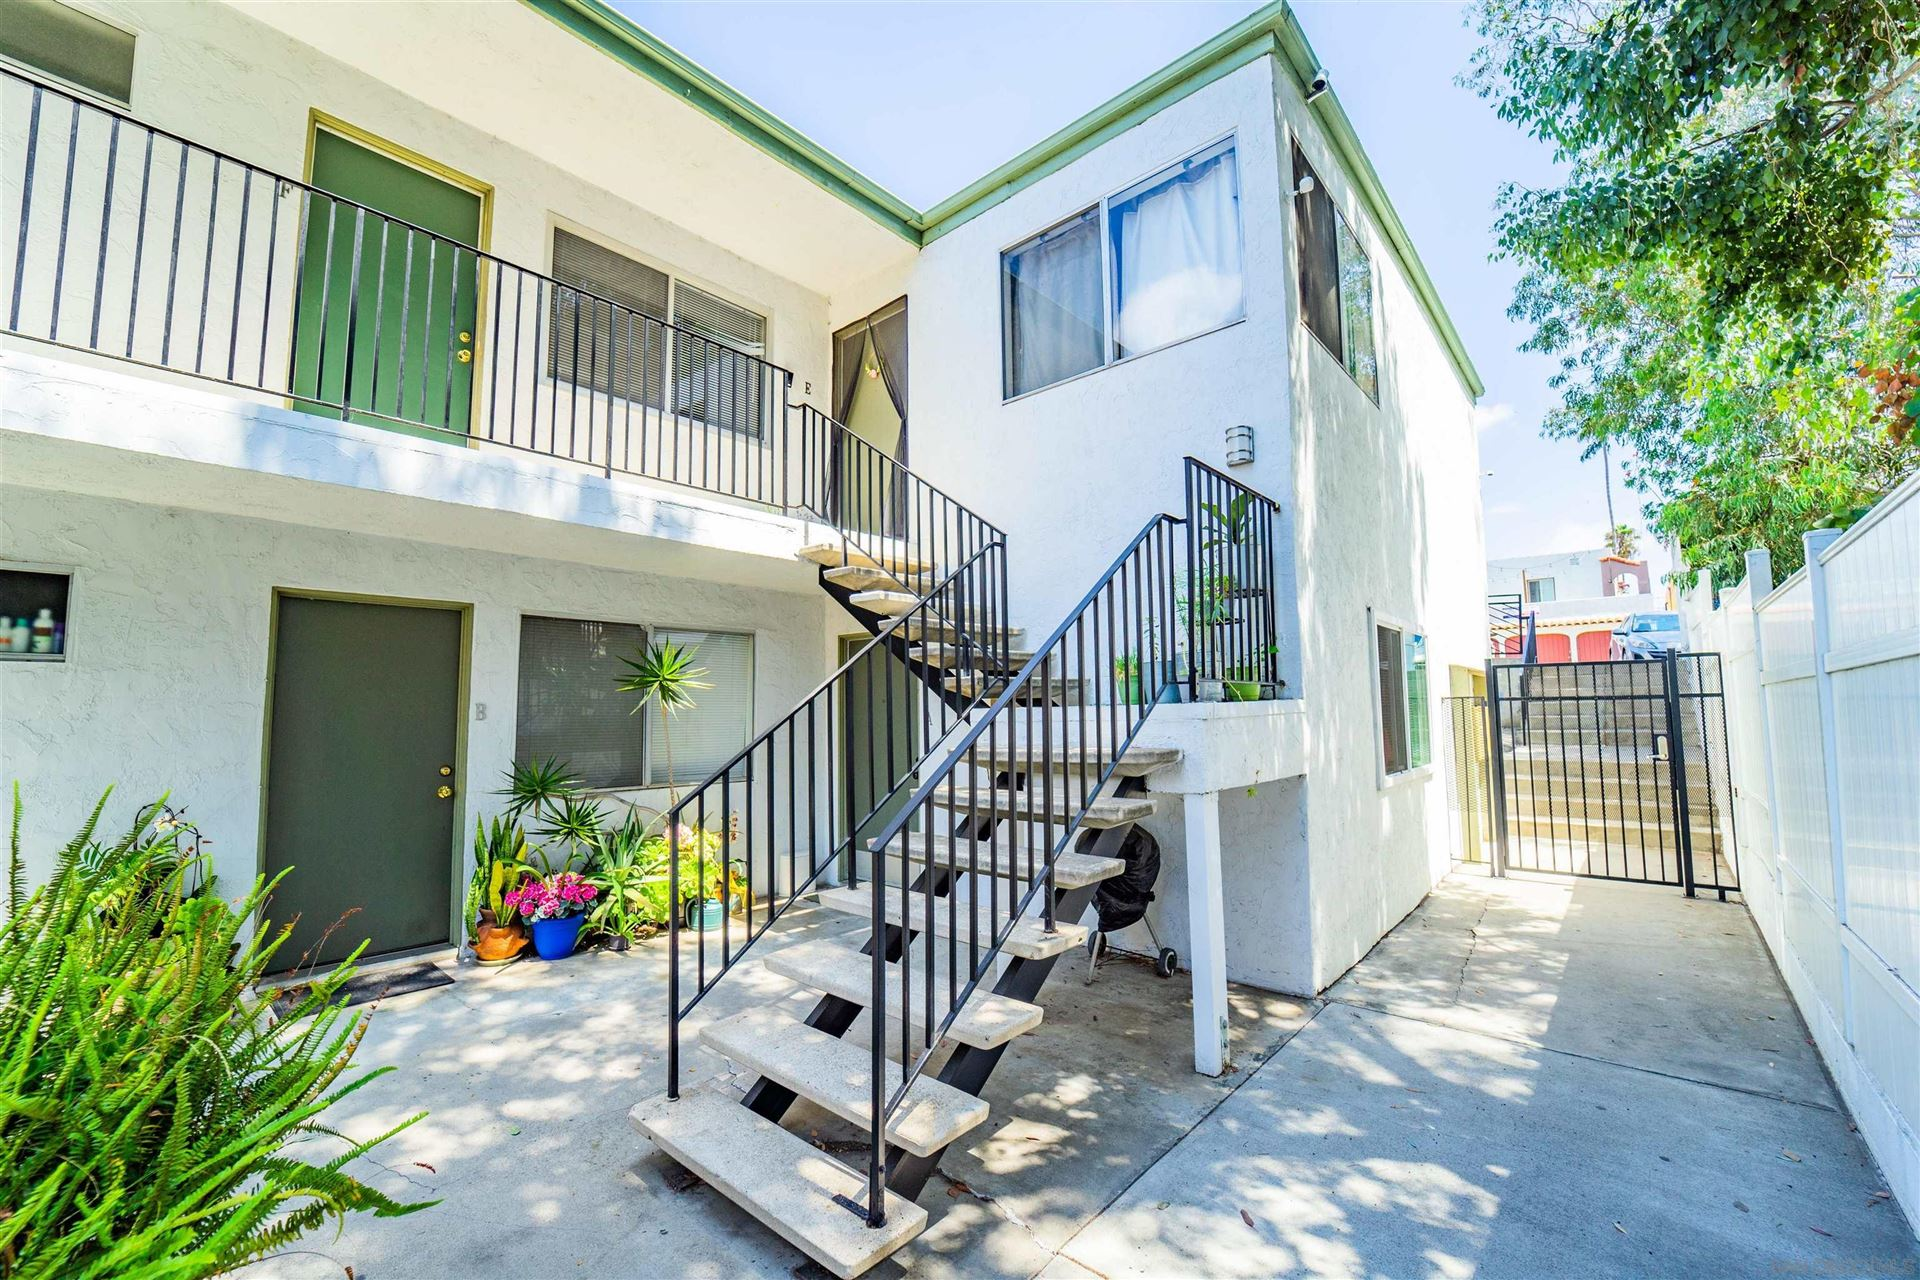 Photo of 3928 Alabama Street, San Diego, CA 92104 (MLS # 210025578)